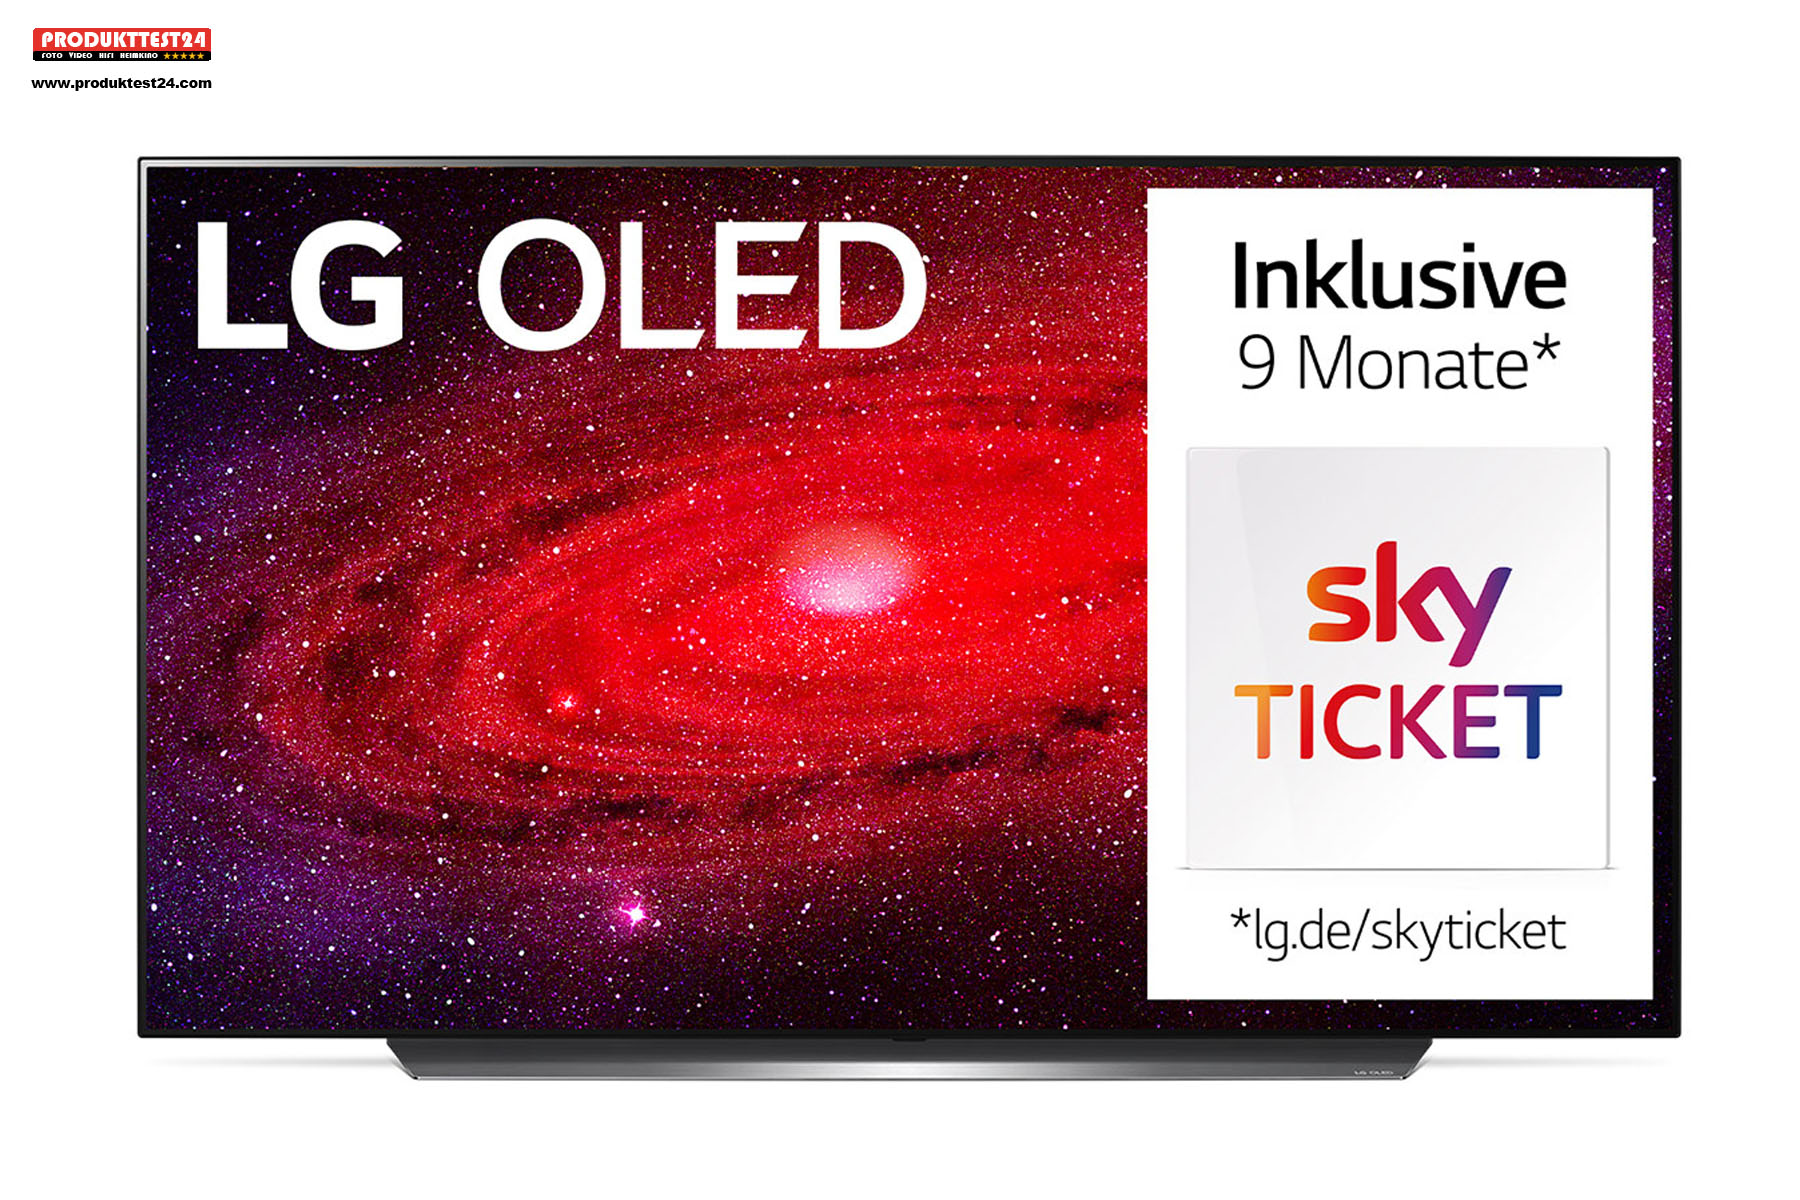 LG OLED65CX9LA - Das neue High End Modell aus dem Hause LG